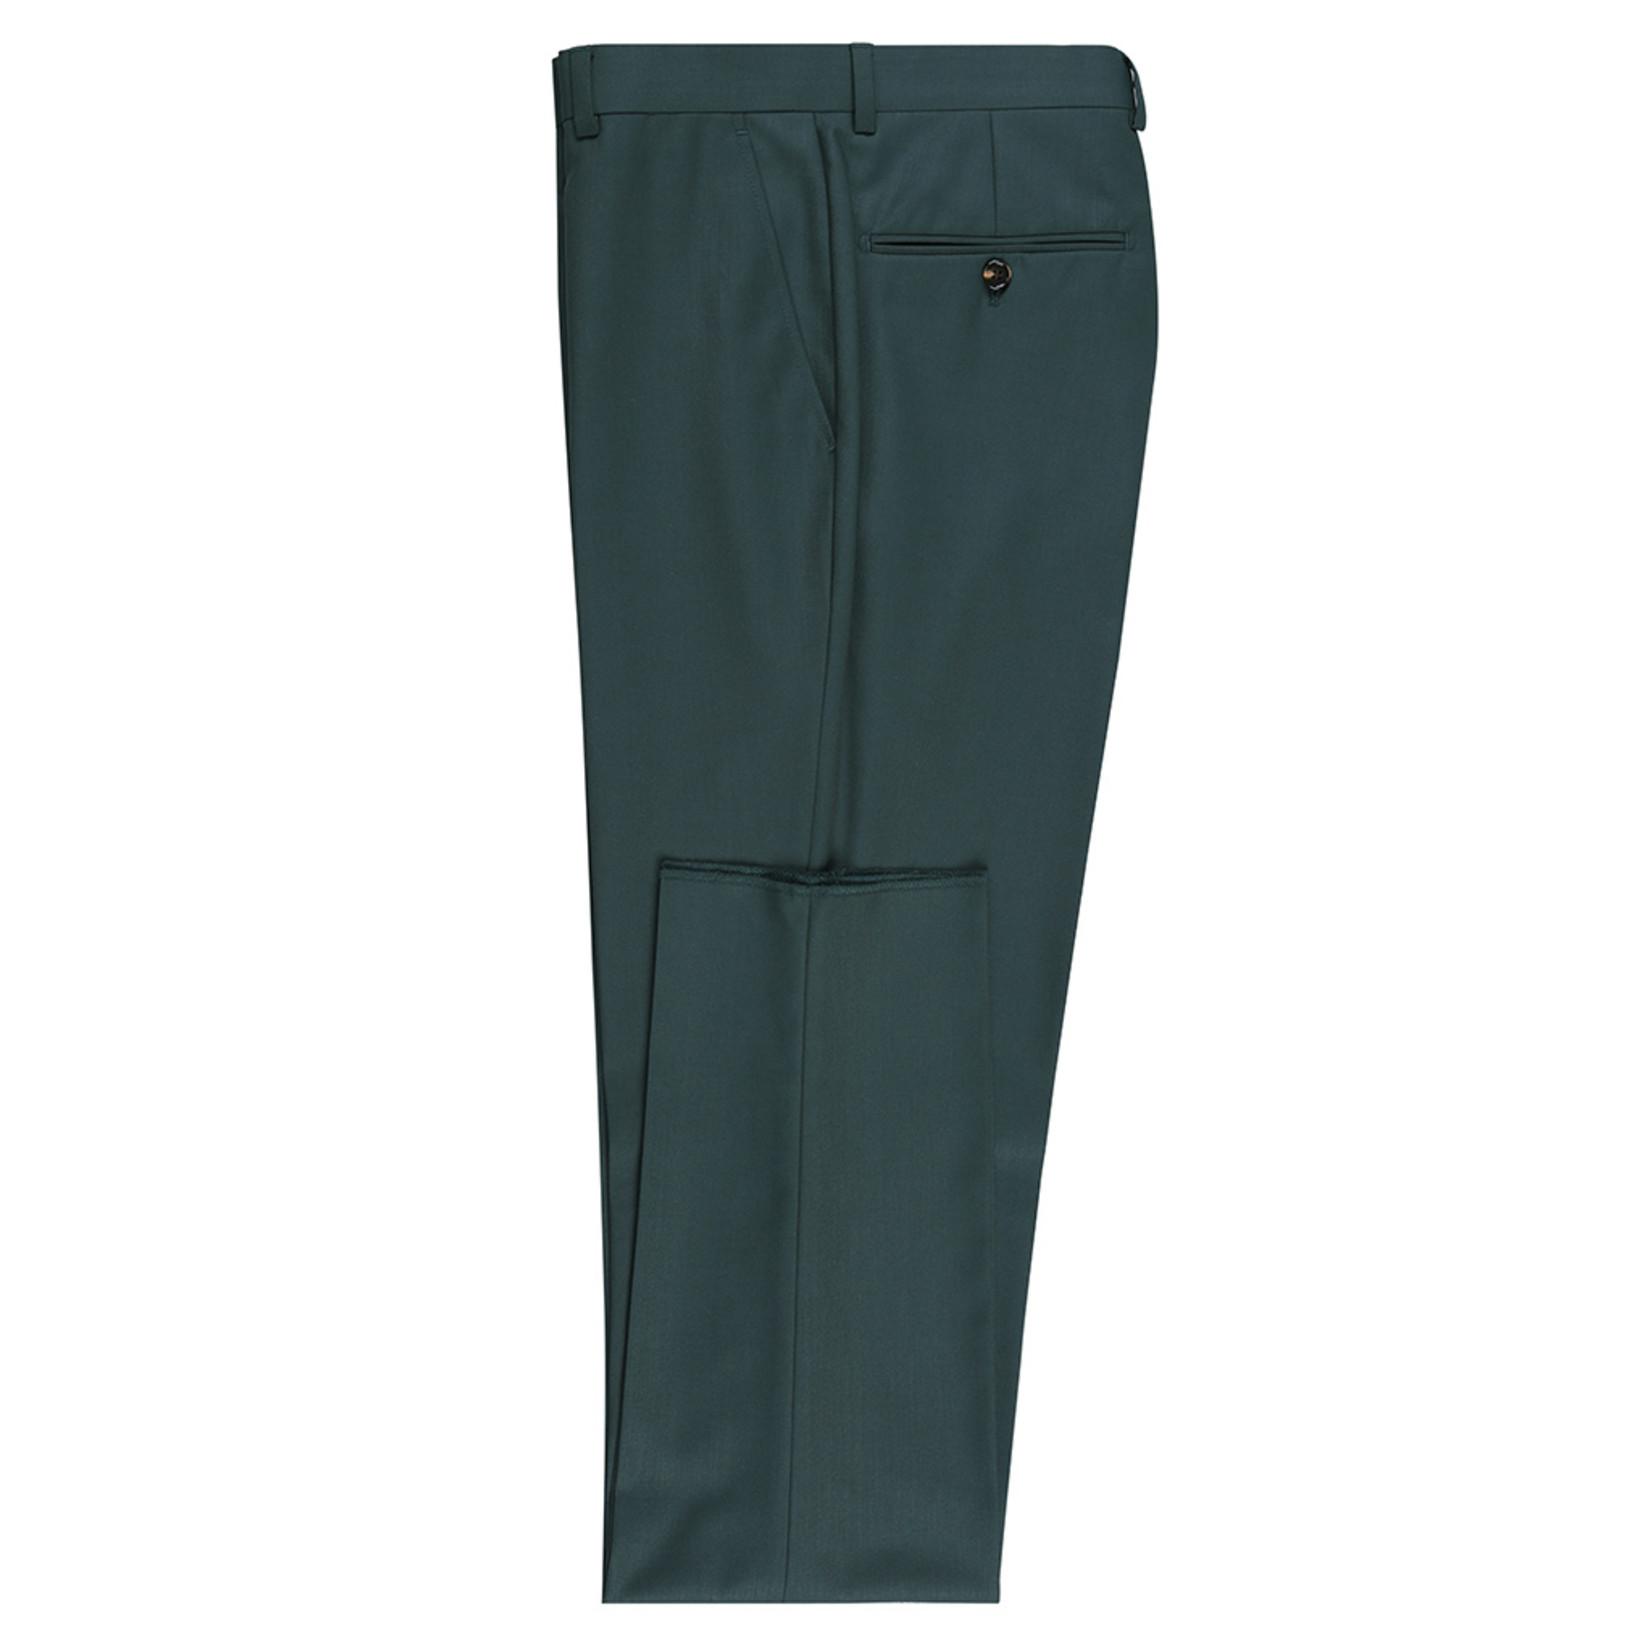 Renoir Renoir Slim Fit Suit 201-9 Forest Green